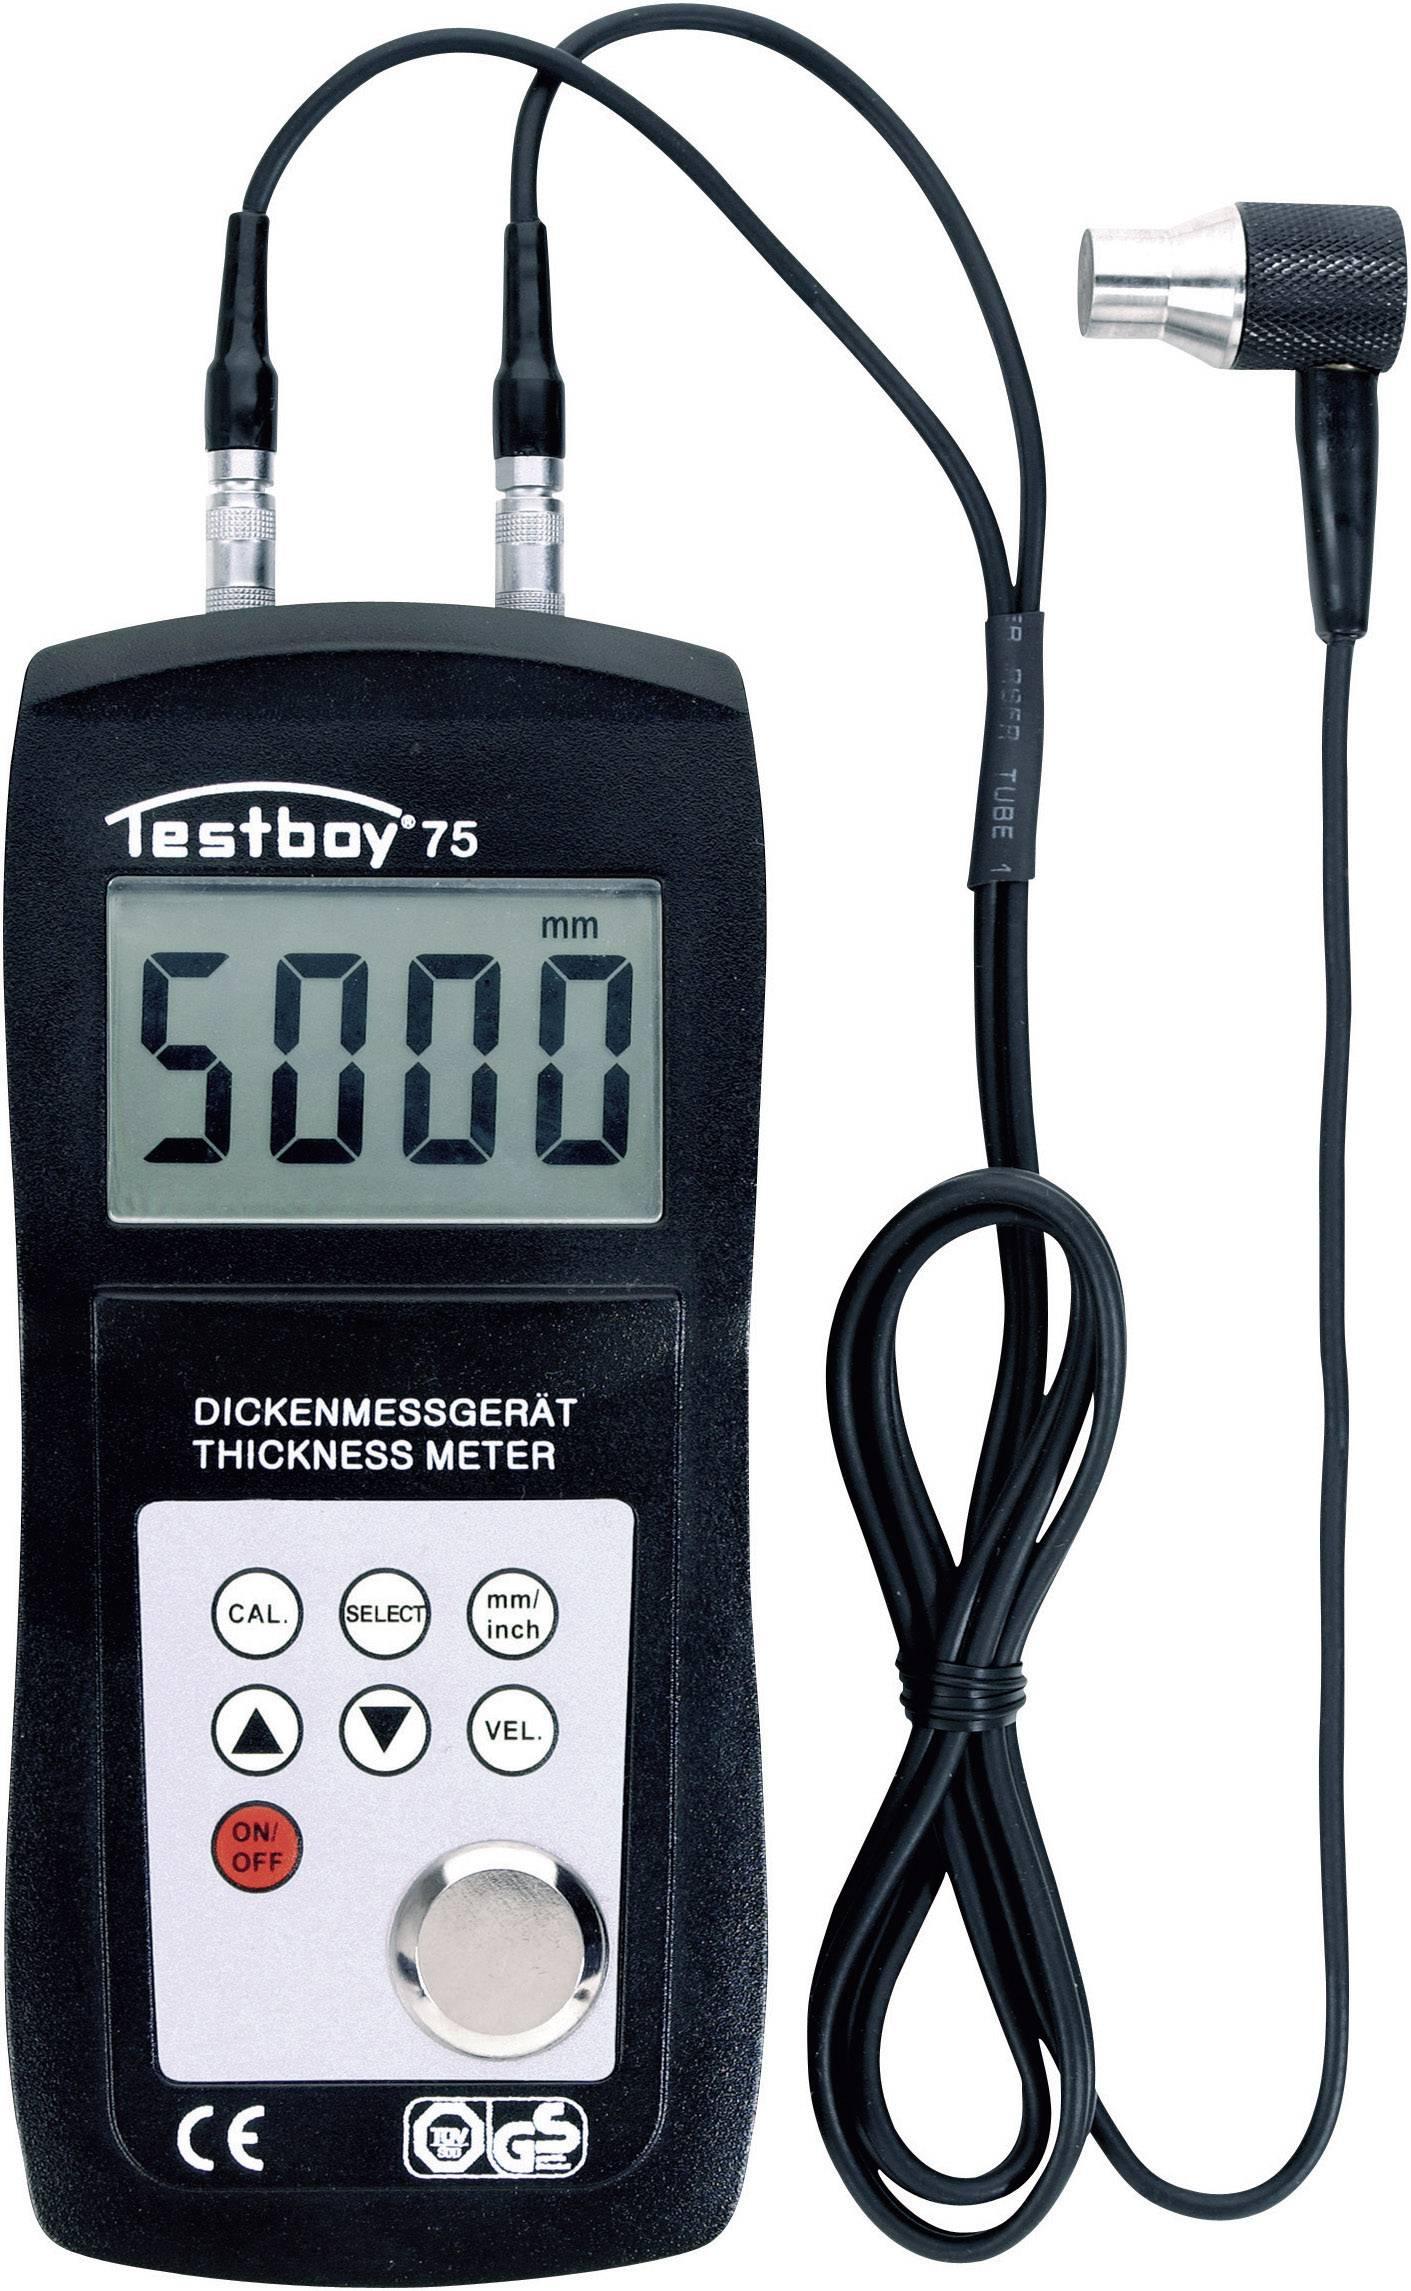 Testboy 75, 1.2 - 200 mm